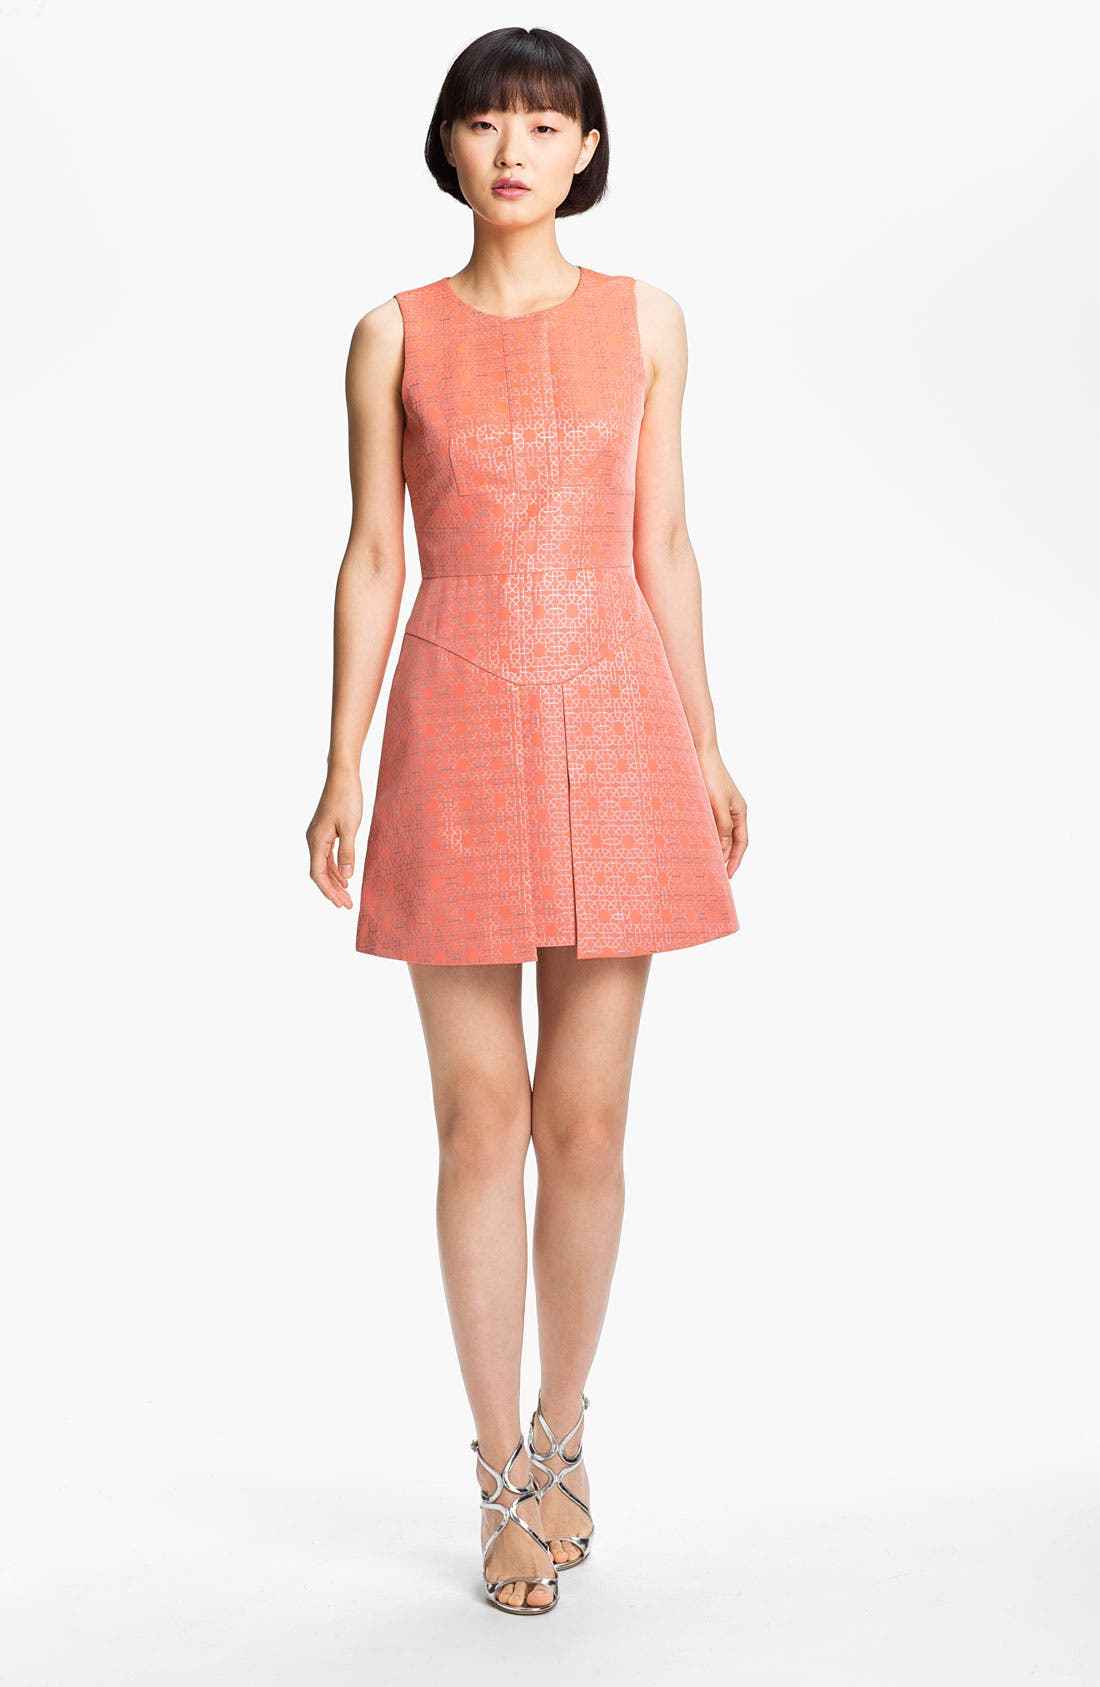 Alternate Image 1 Selected - Tibi Metallic Jacquard Dress